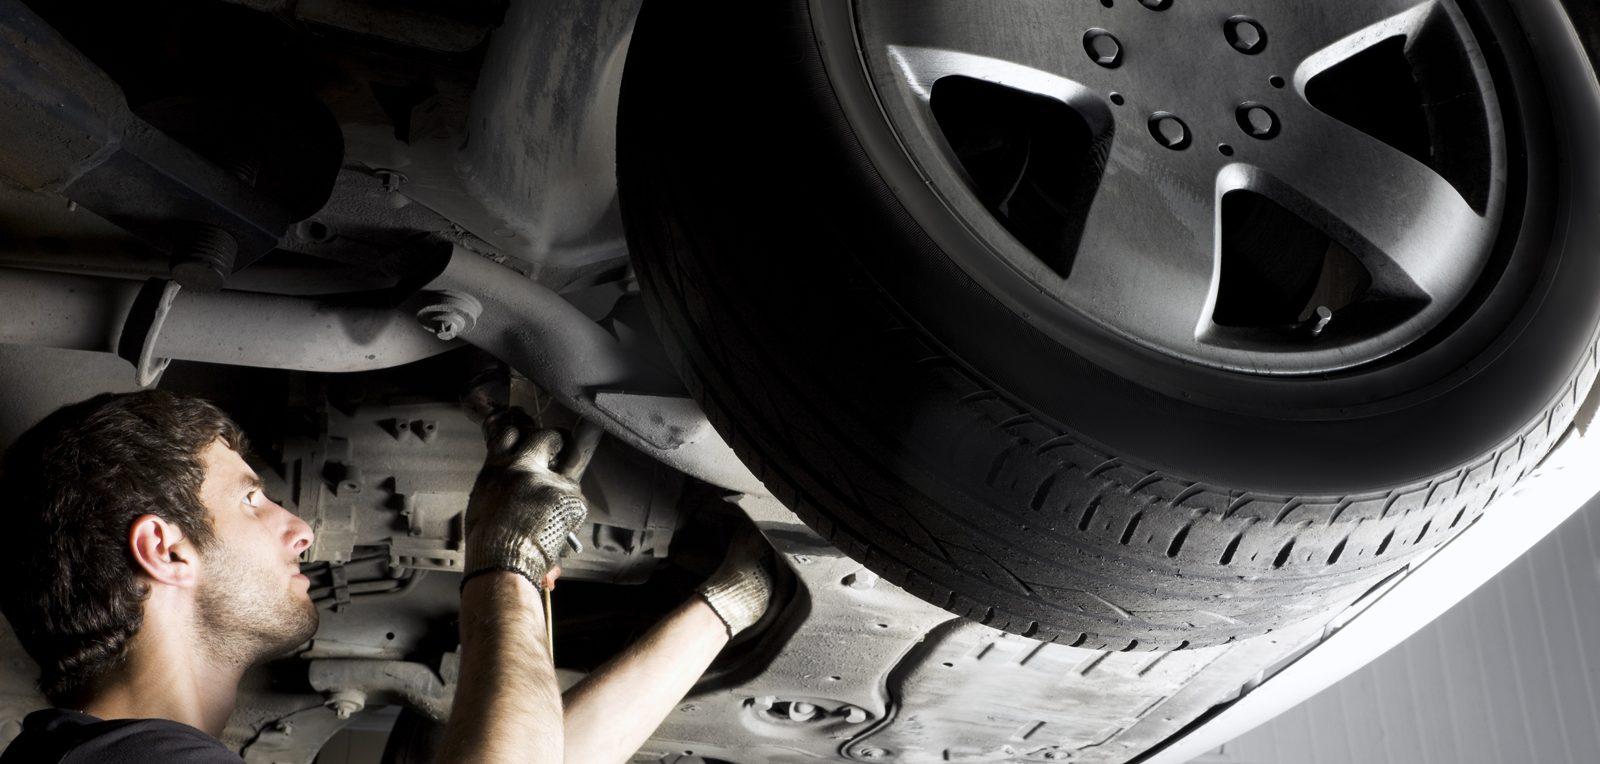 Регулярная замена деталей автомобиля